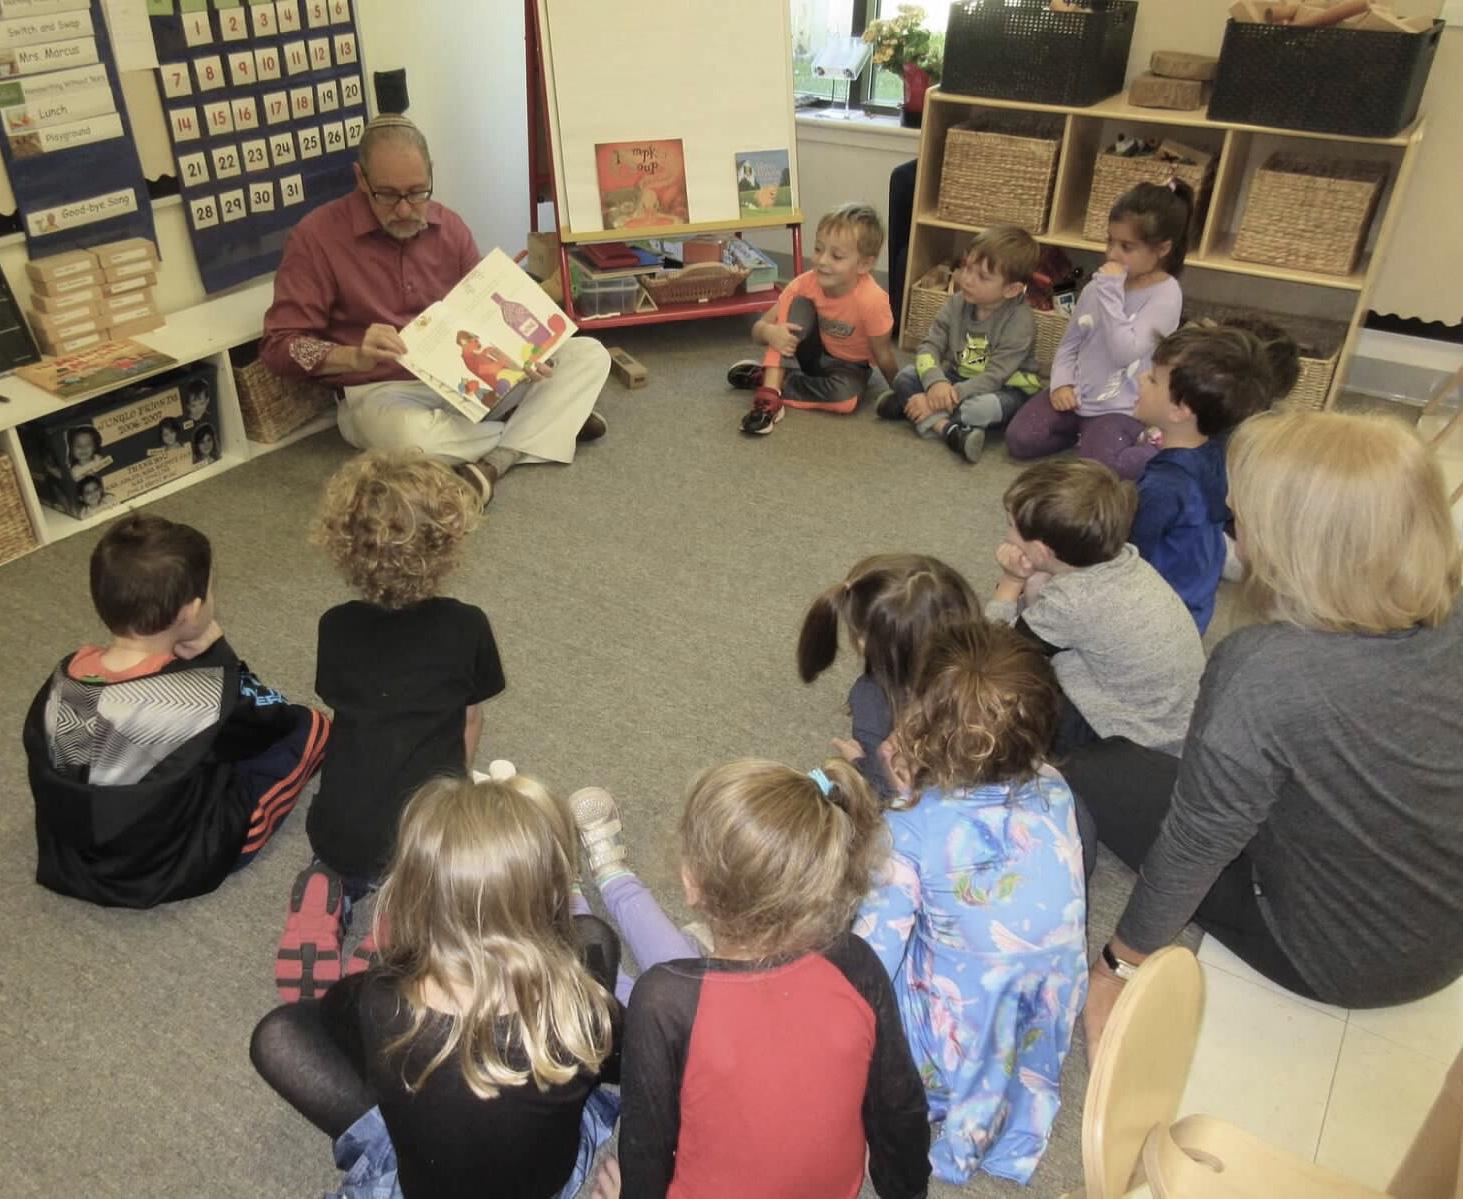 rabbi Pokras reads